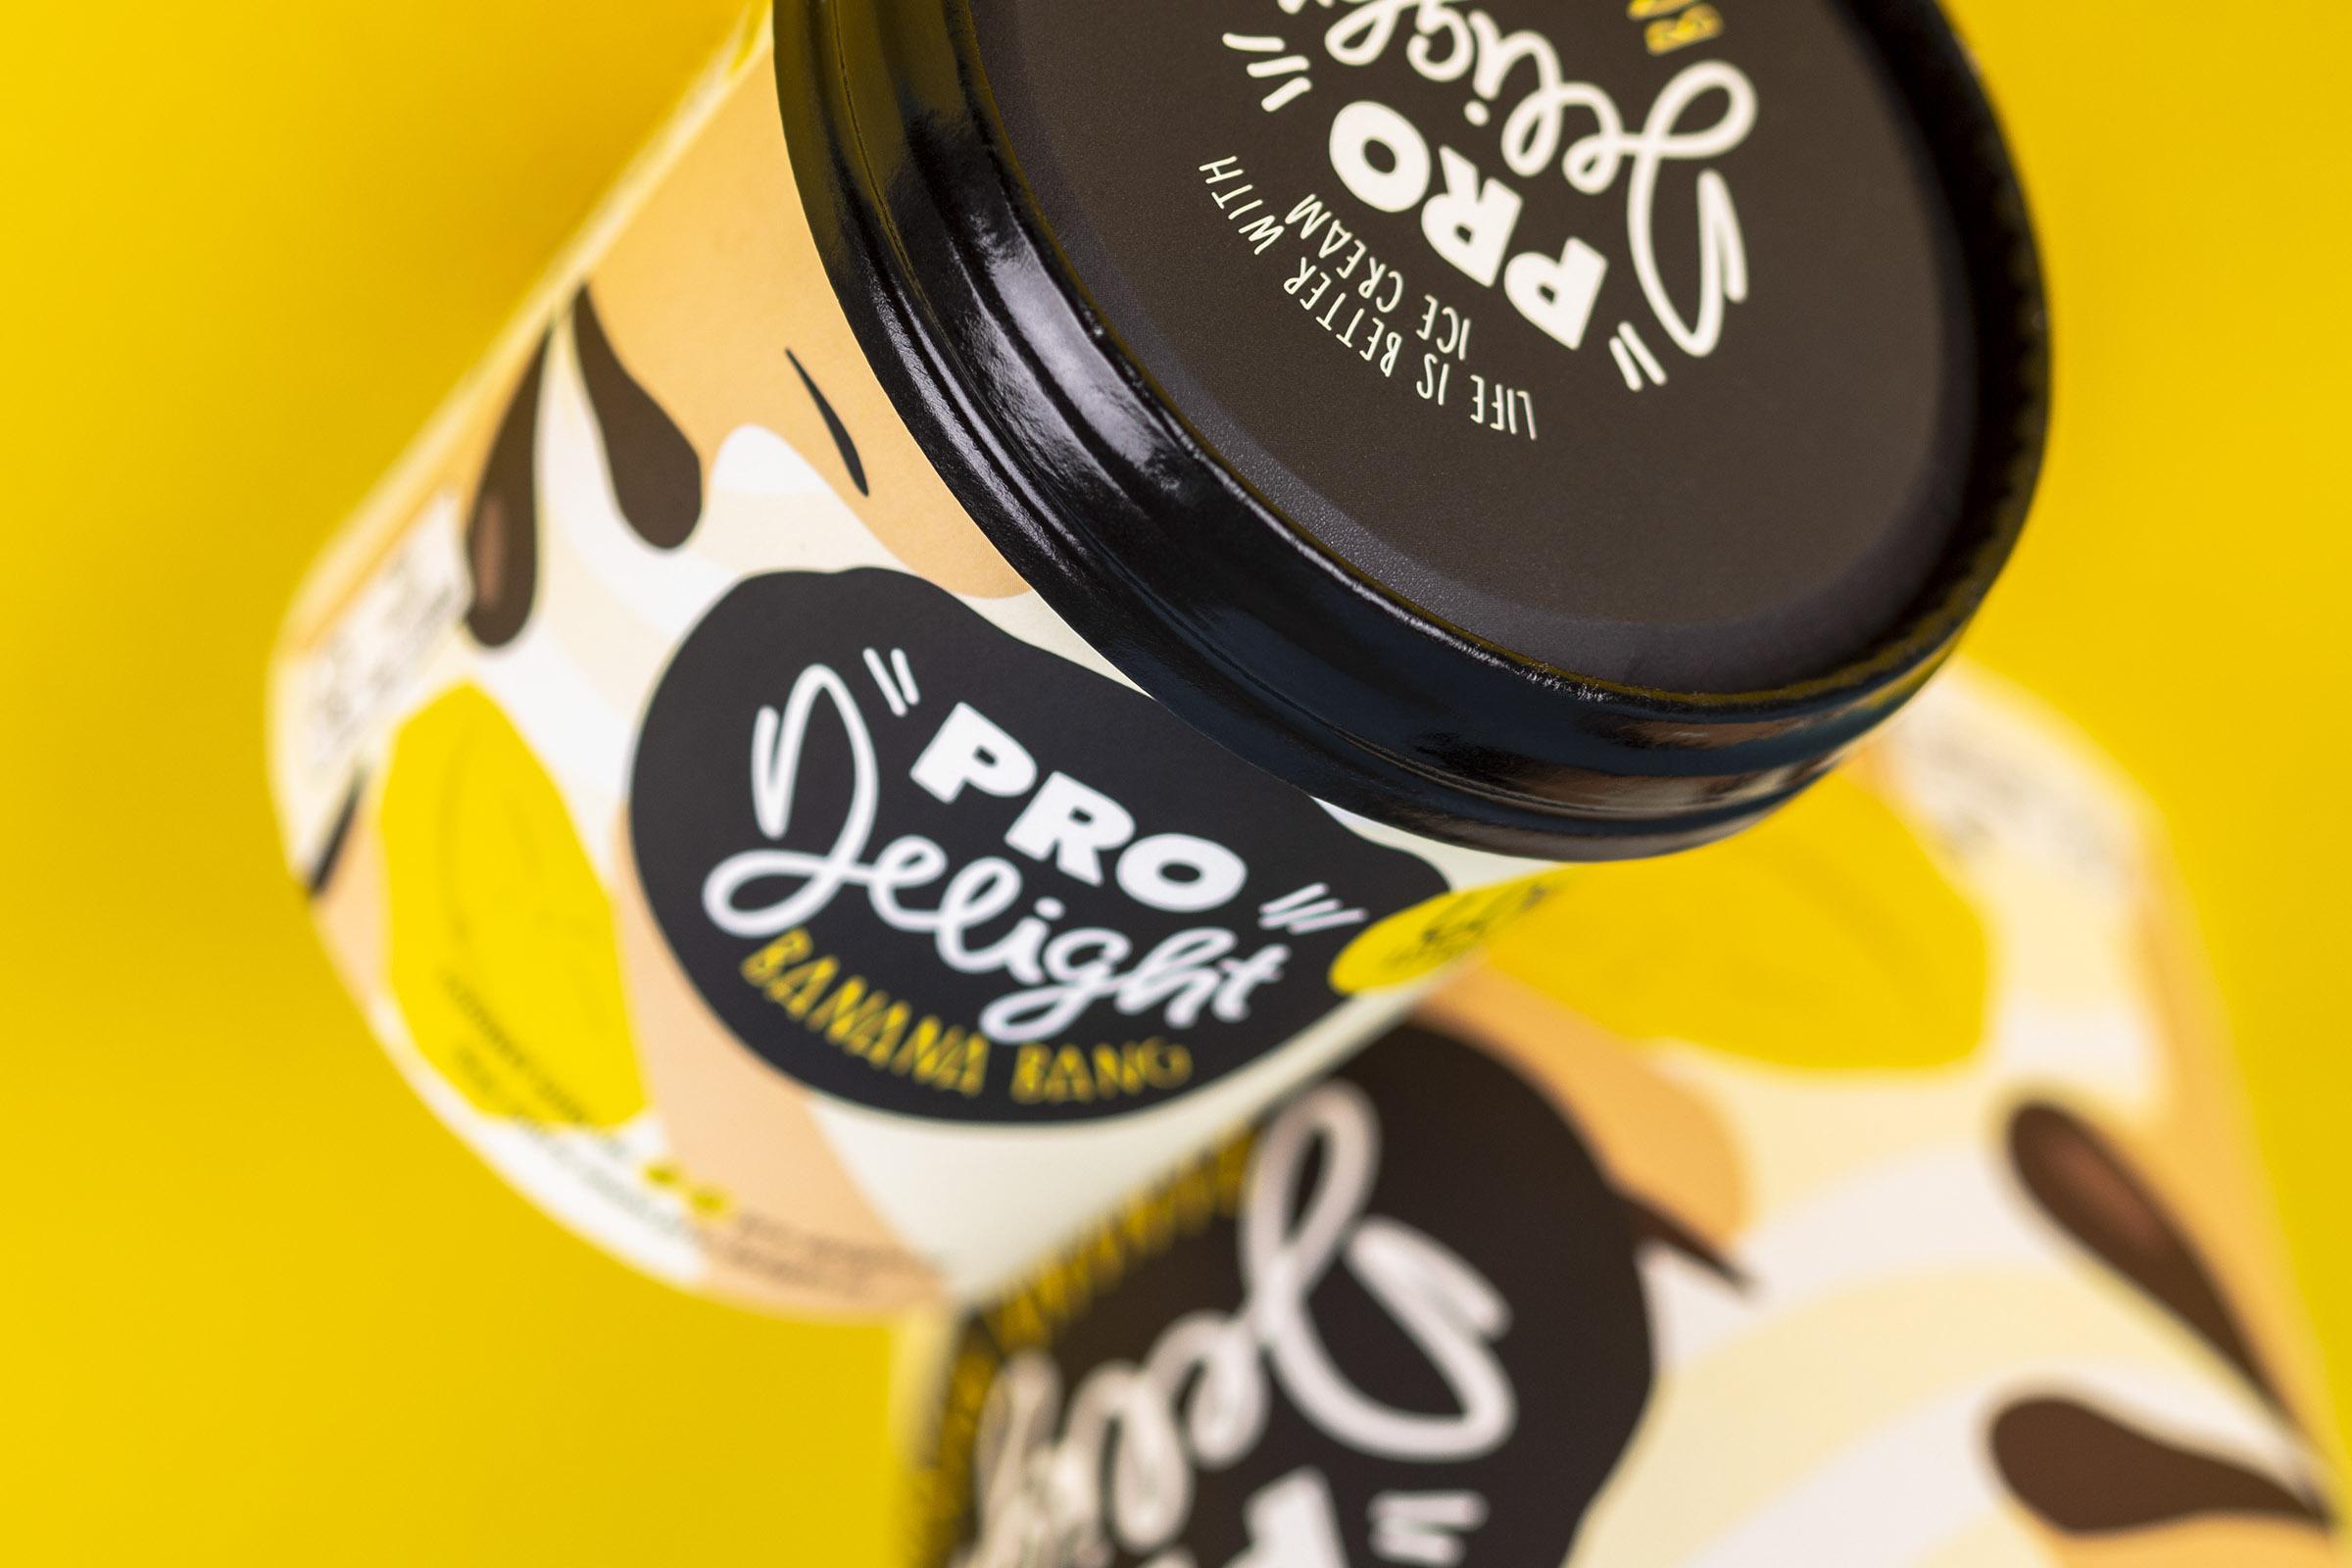 Pro Delight | 果汁咖啡杯子设计插图(1)